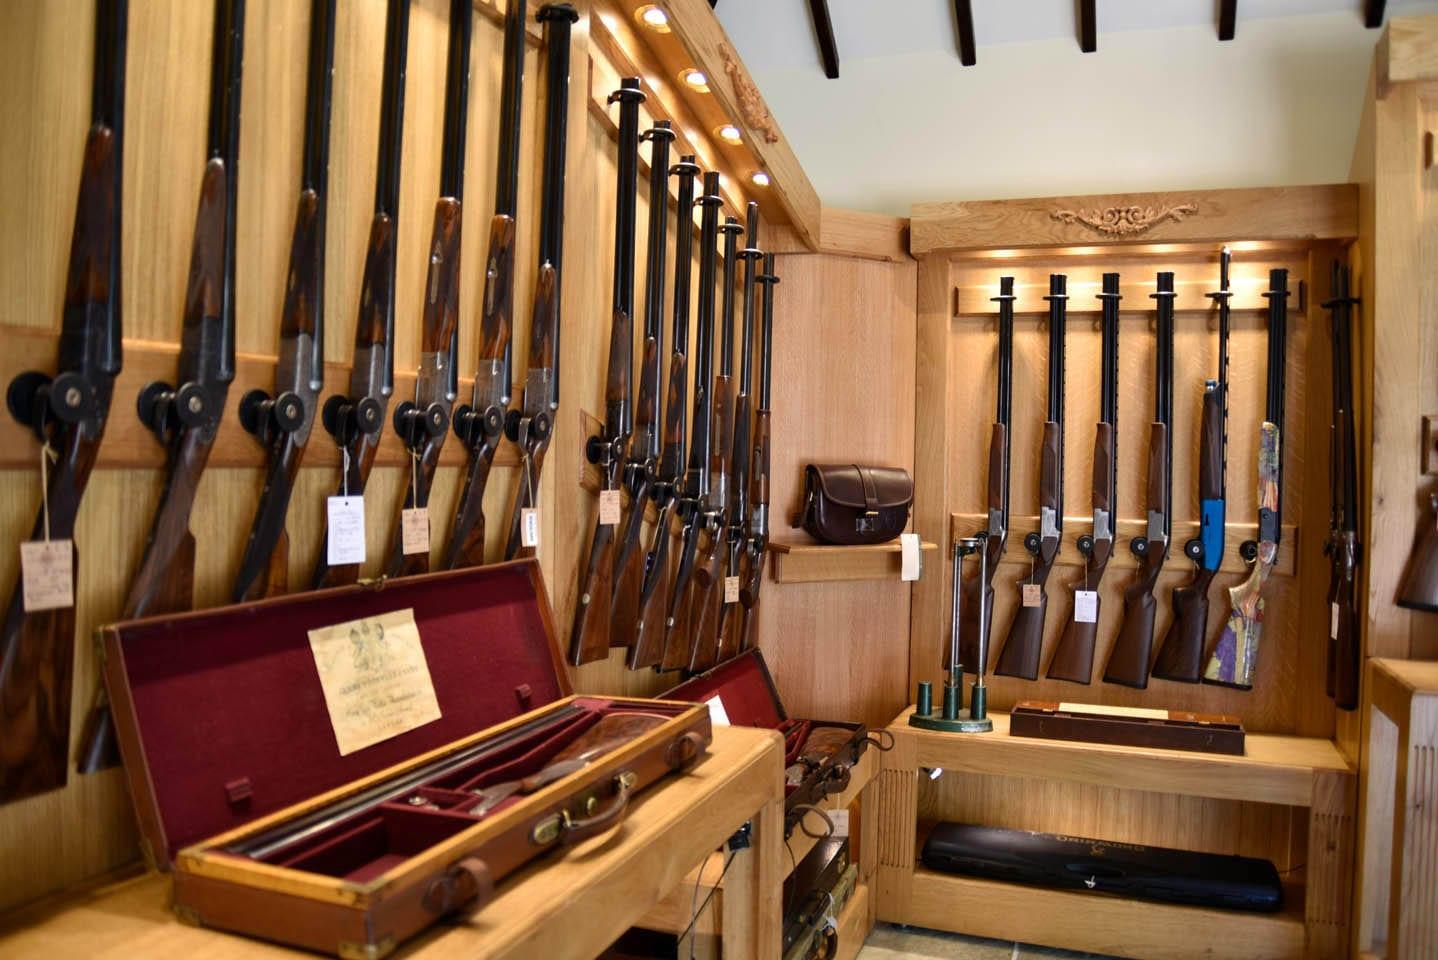 Gun rack at Sportarm at Lady's Wood Gun Room